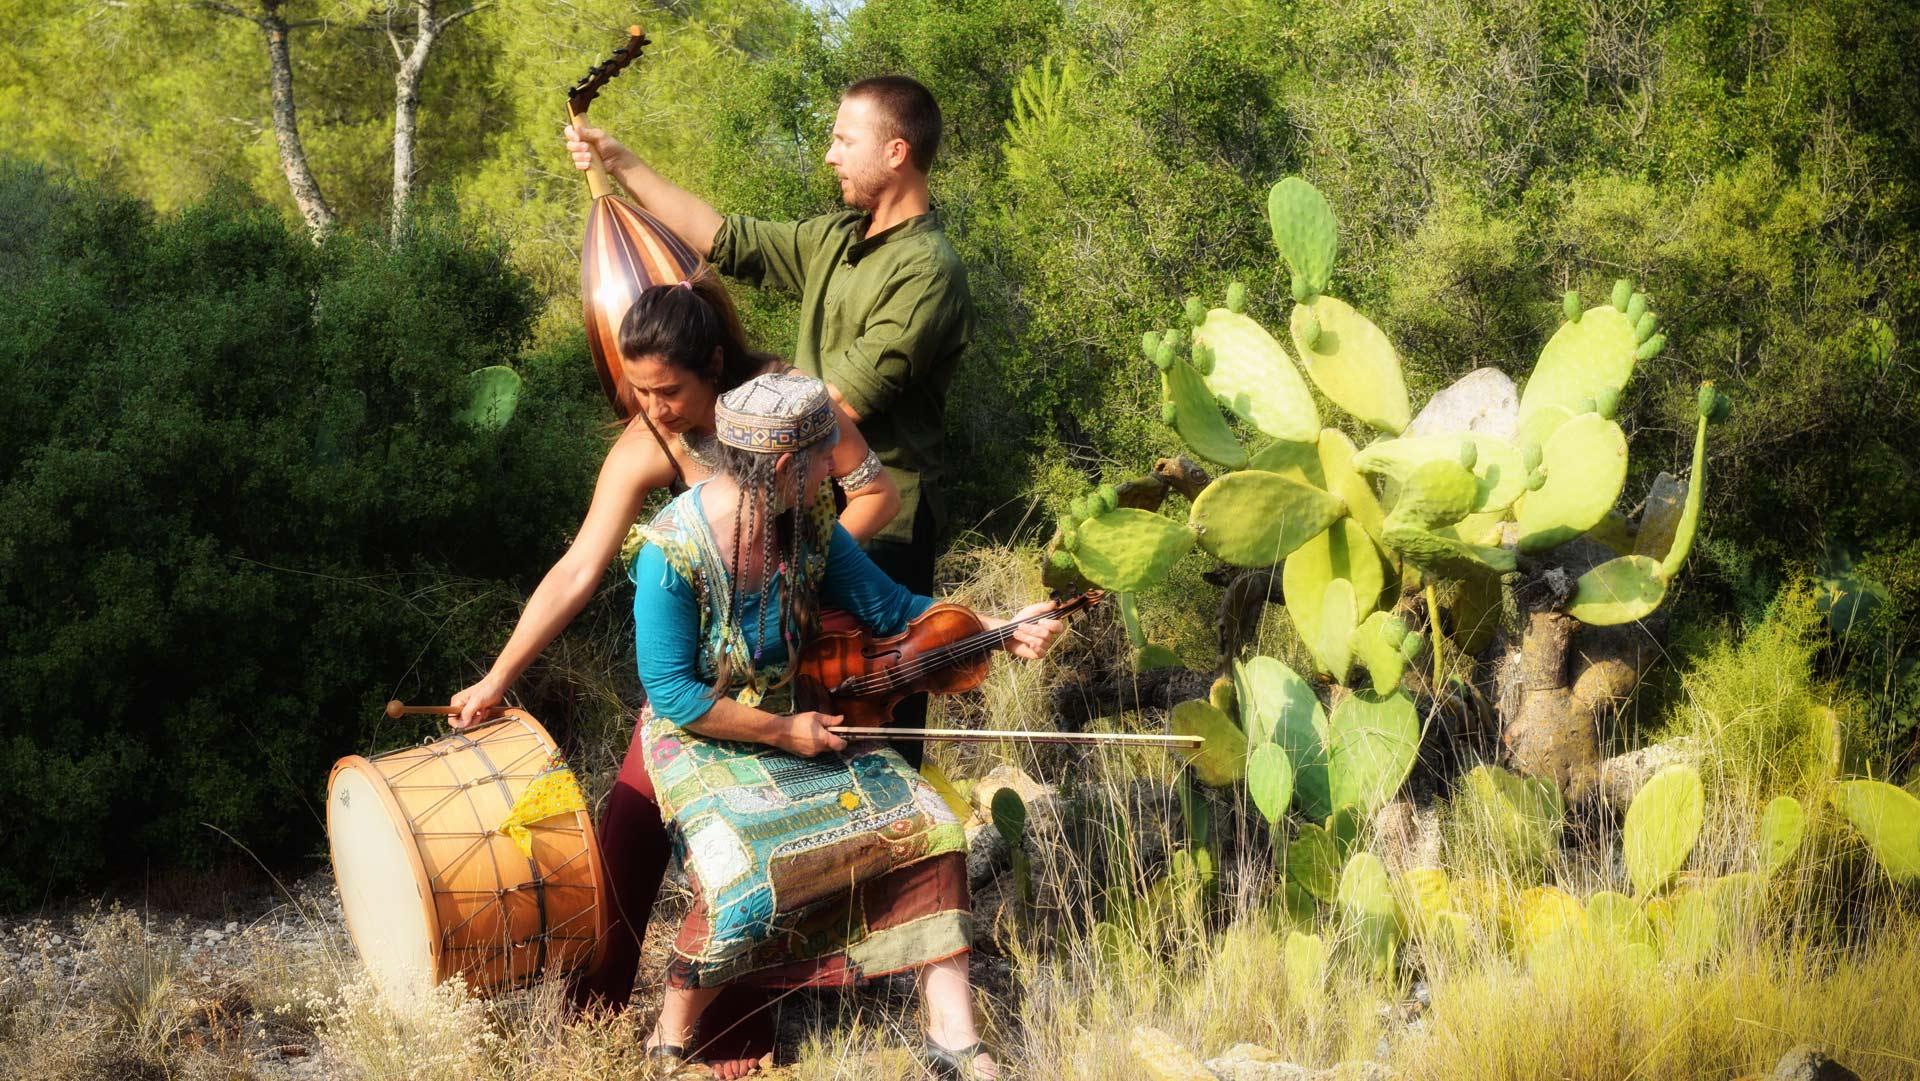 besrabia musica klezmer mediterraneo balkan